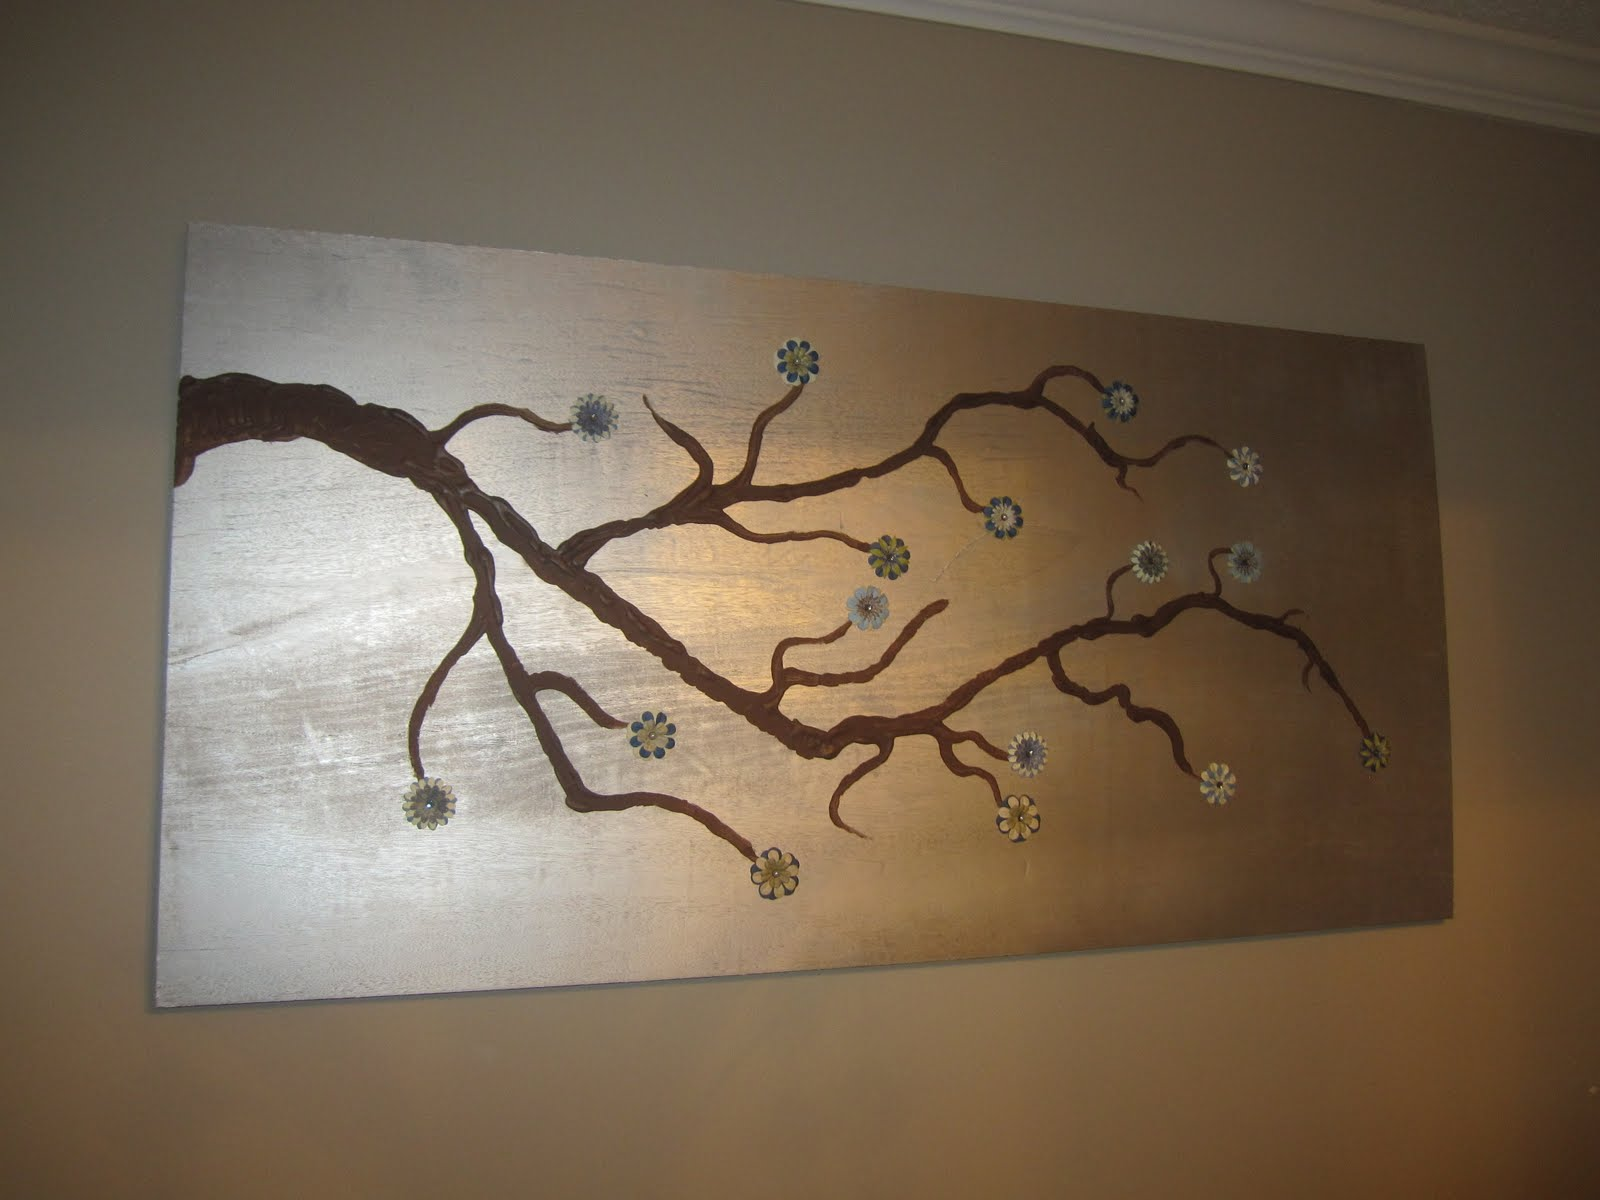 Tree Branch Wall Decor | www.imgkid.com - The Image Kid ...